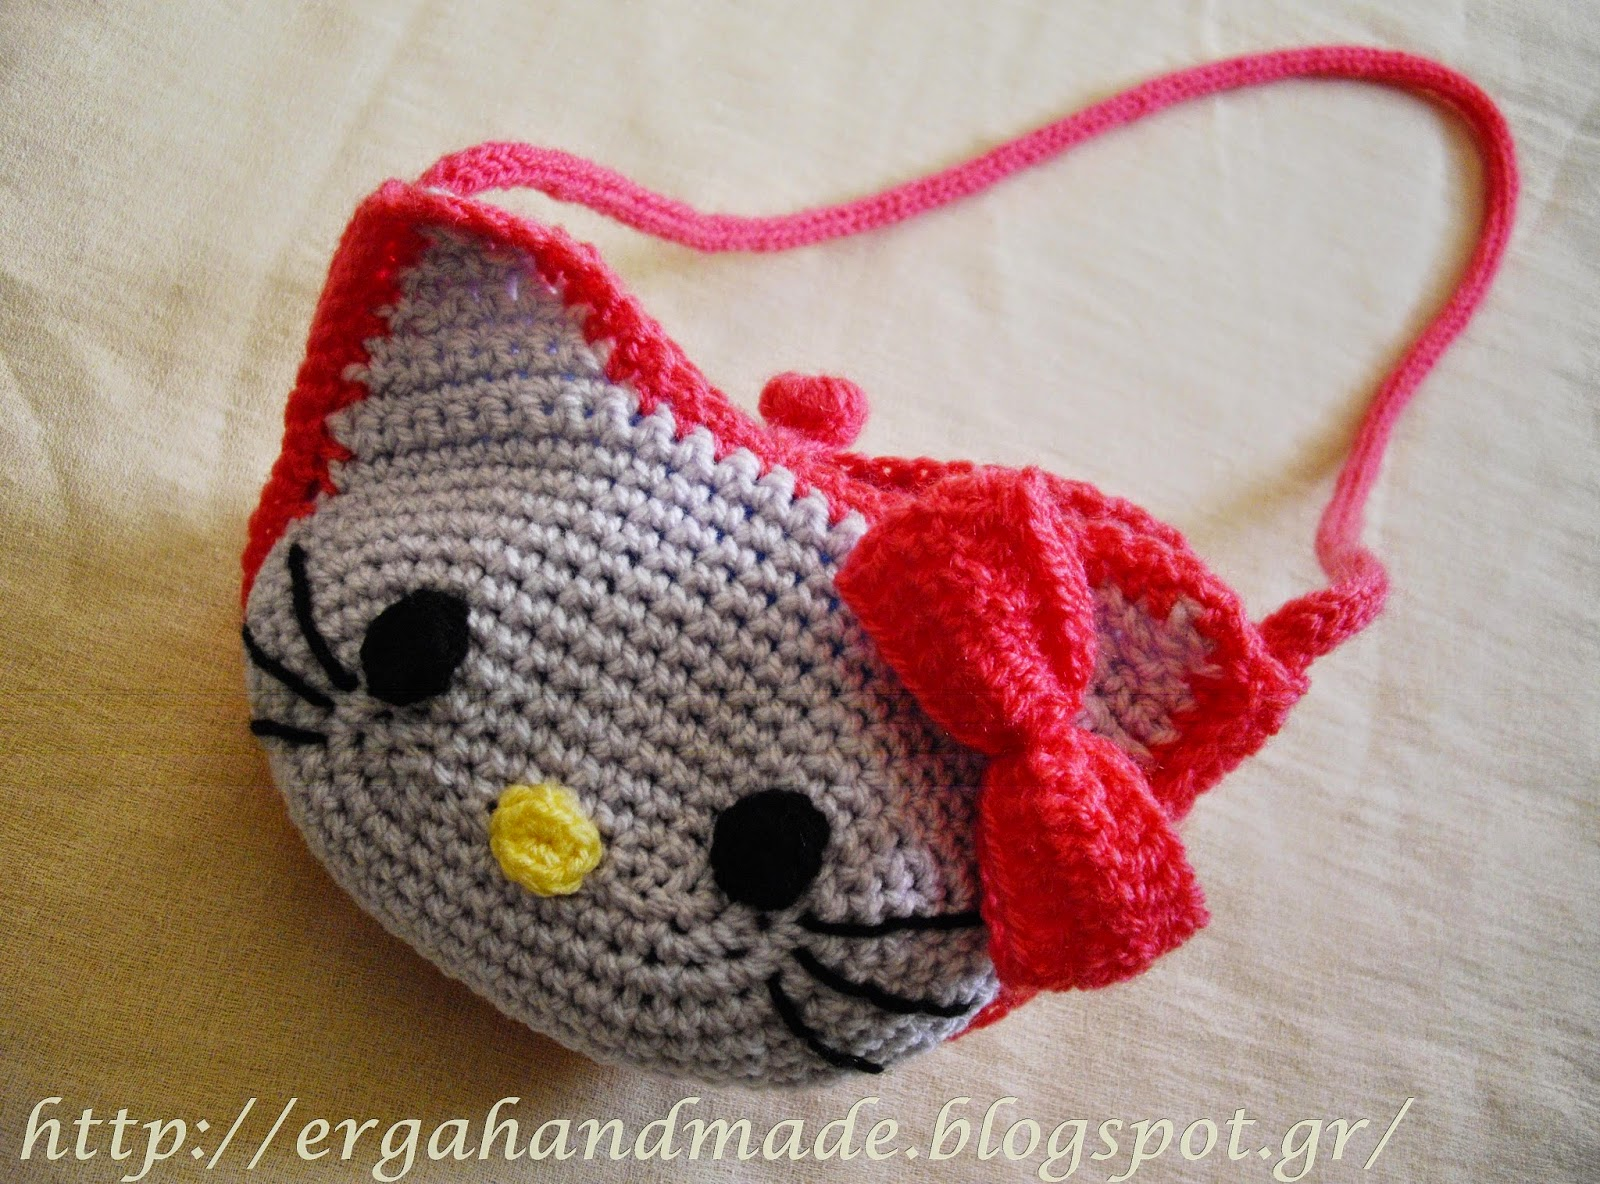 Ergahandmade Hello Kitty Crochet Bag